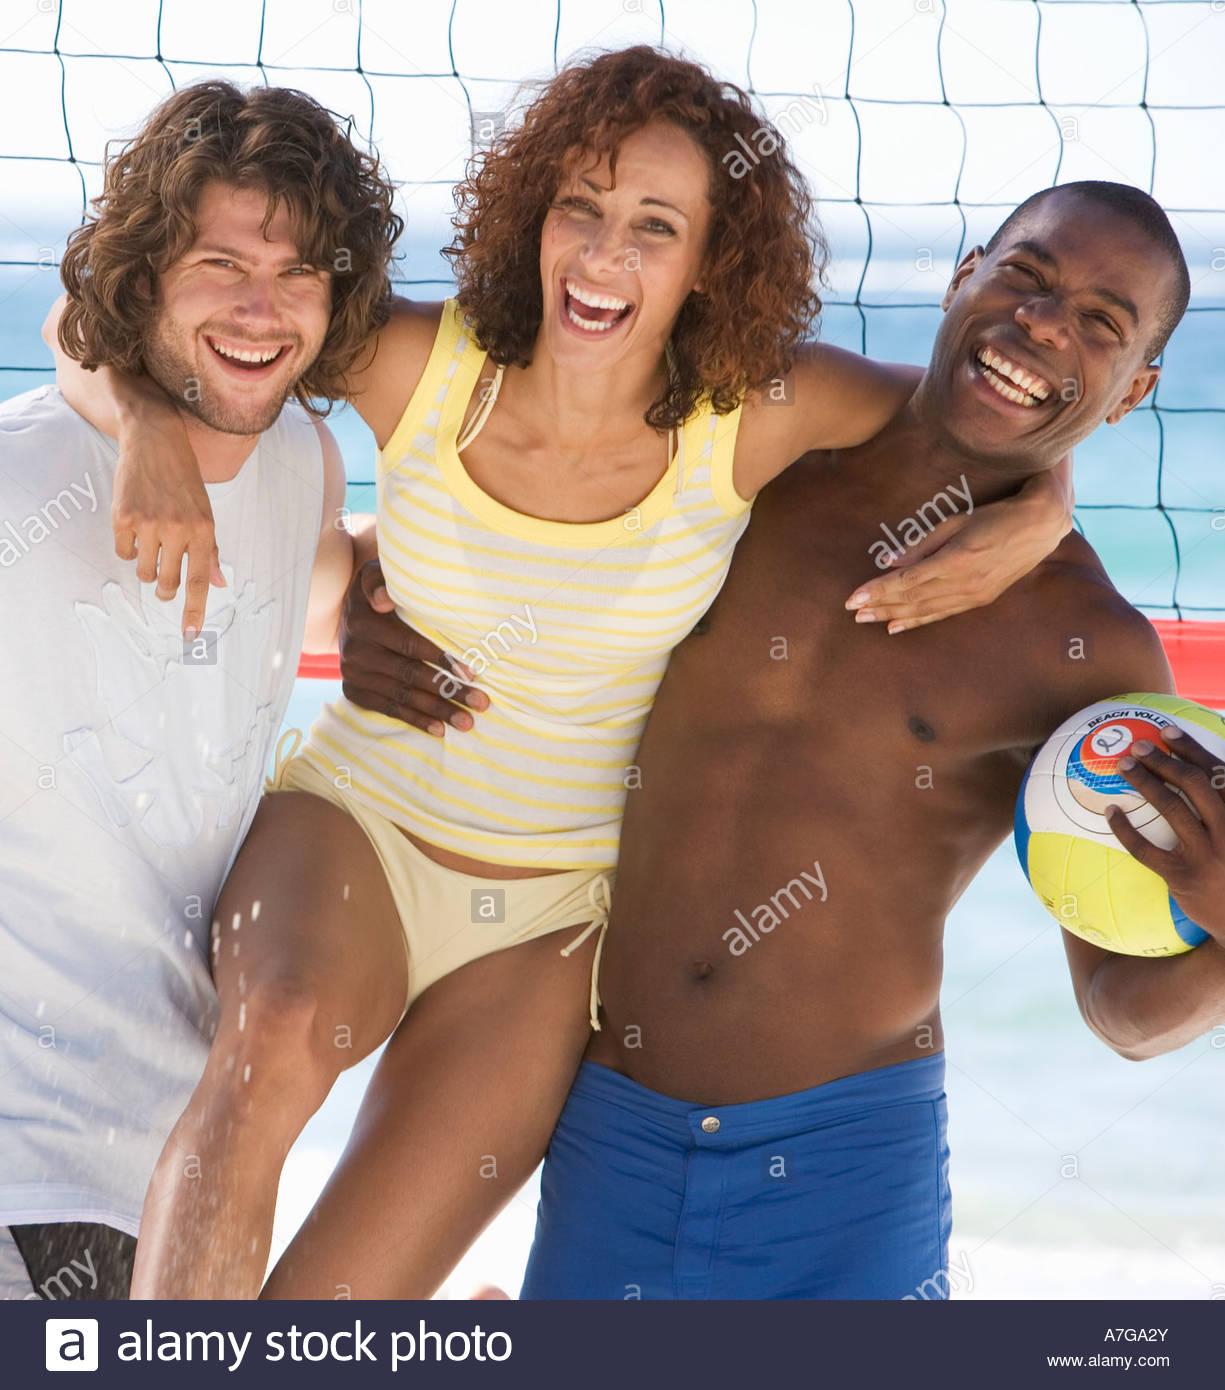 Three friends on a beach - Stock Image